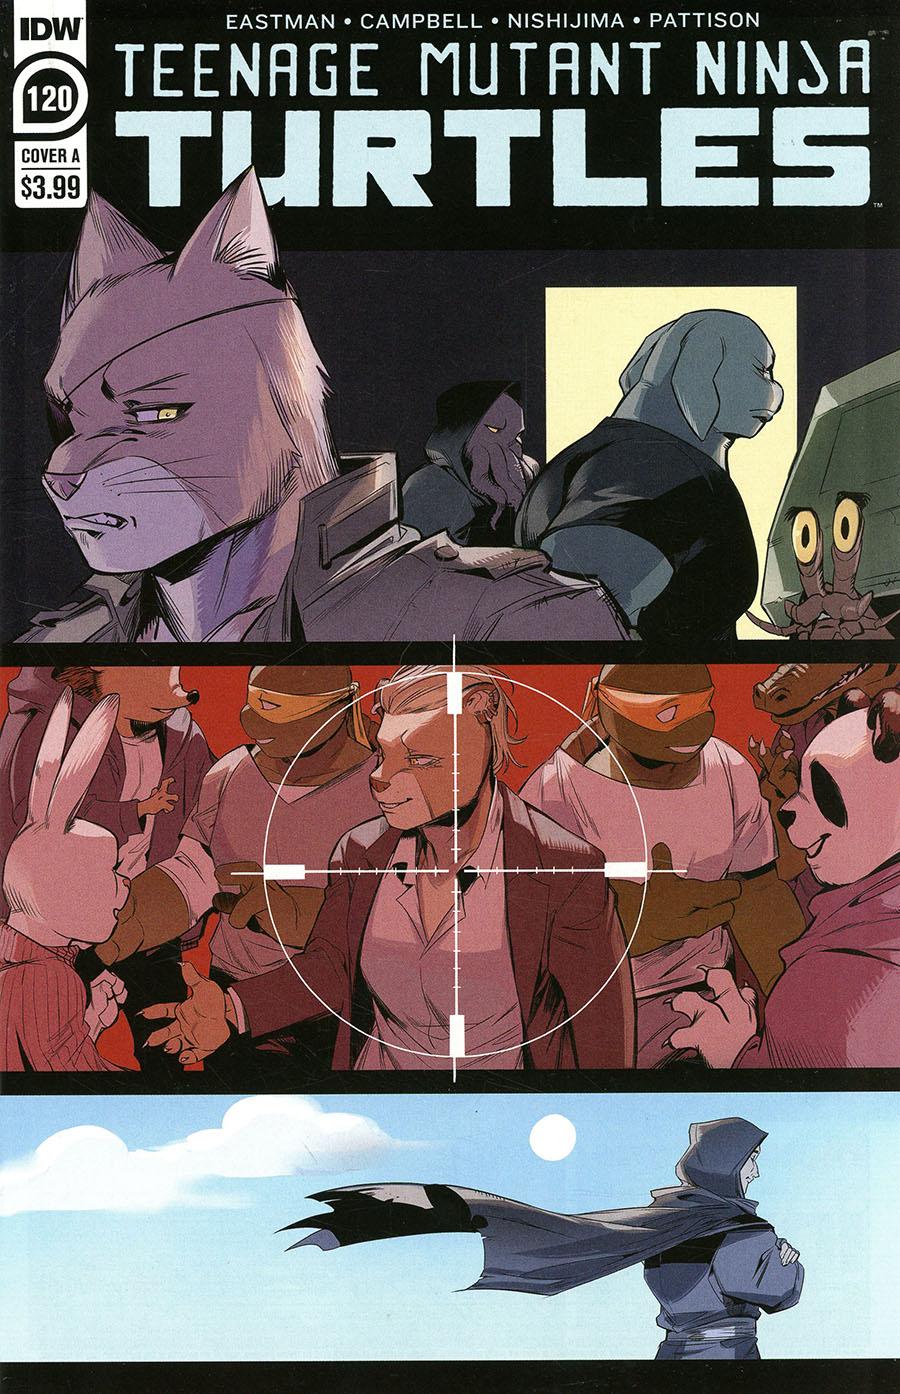 Teenage Mutant Ninja Turtles Vol 5 #120 Cover A Regular Jodi Nishijima Cover